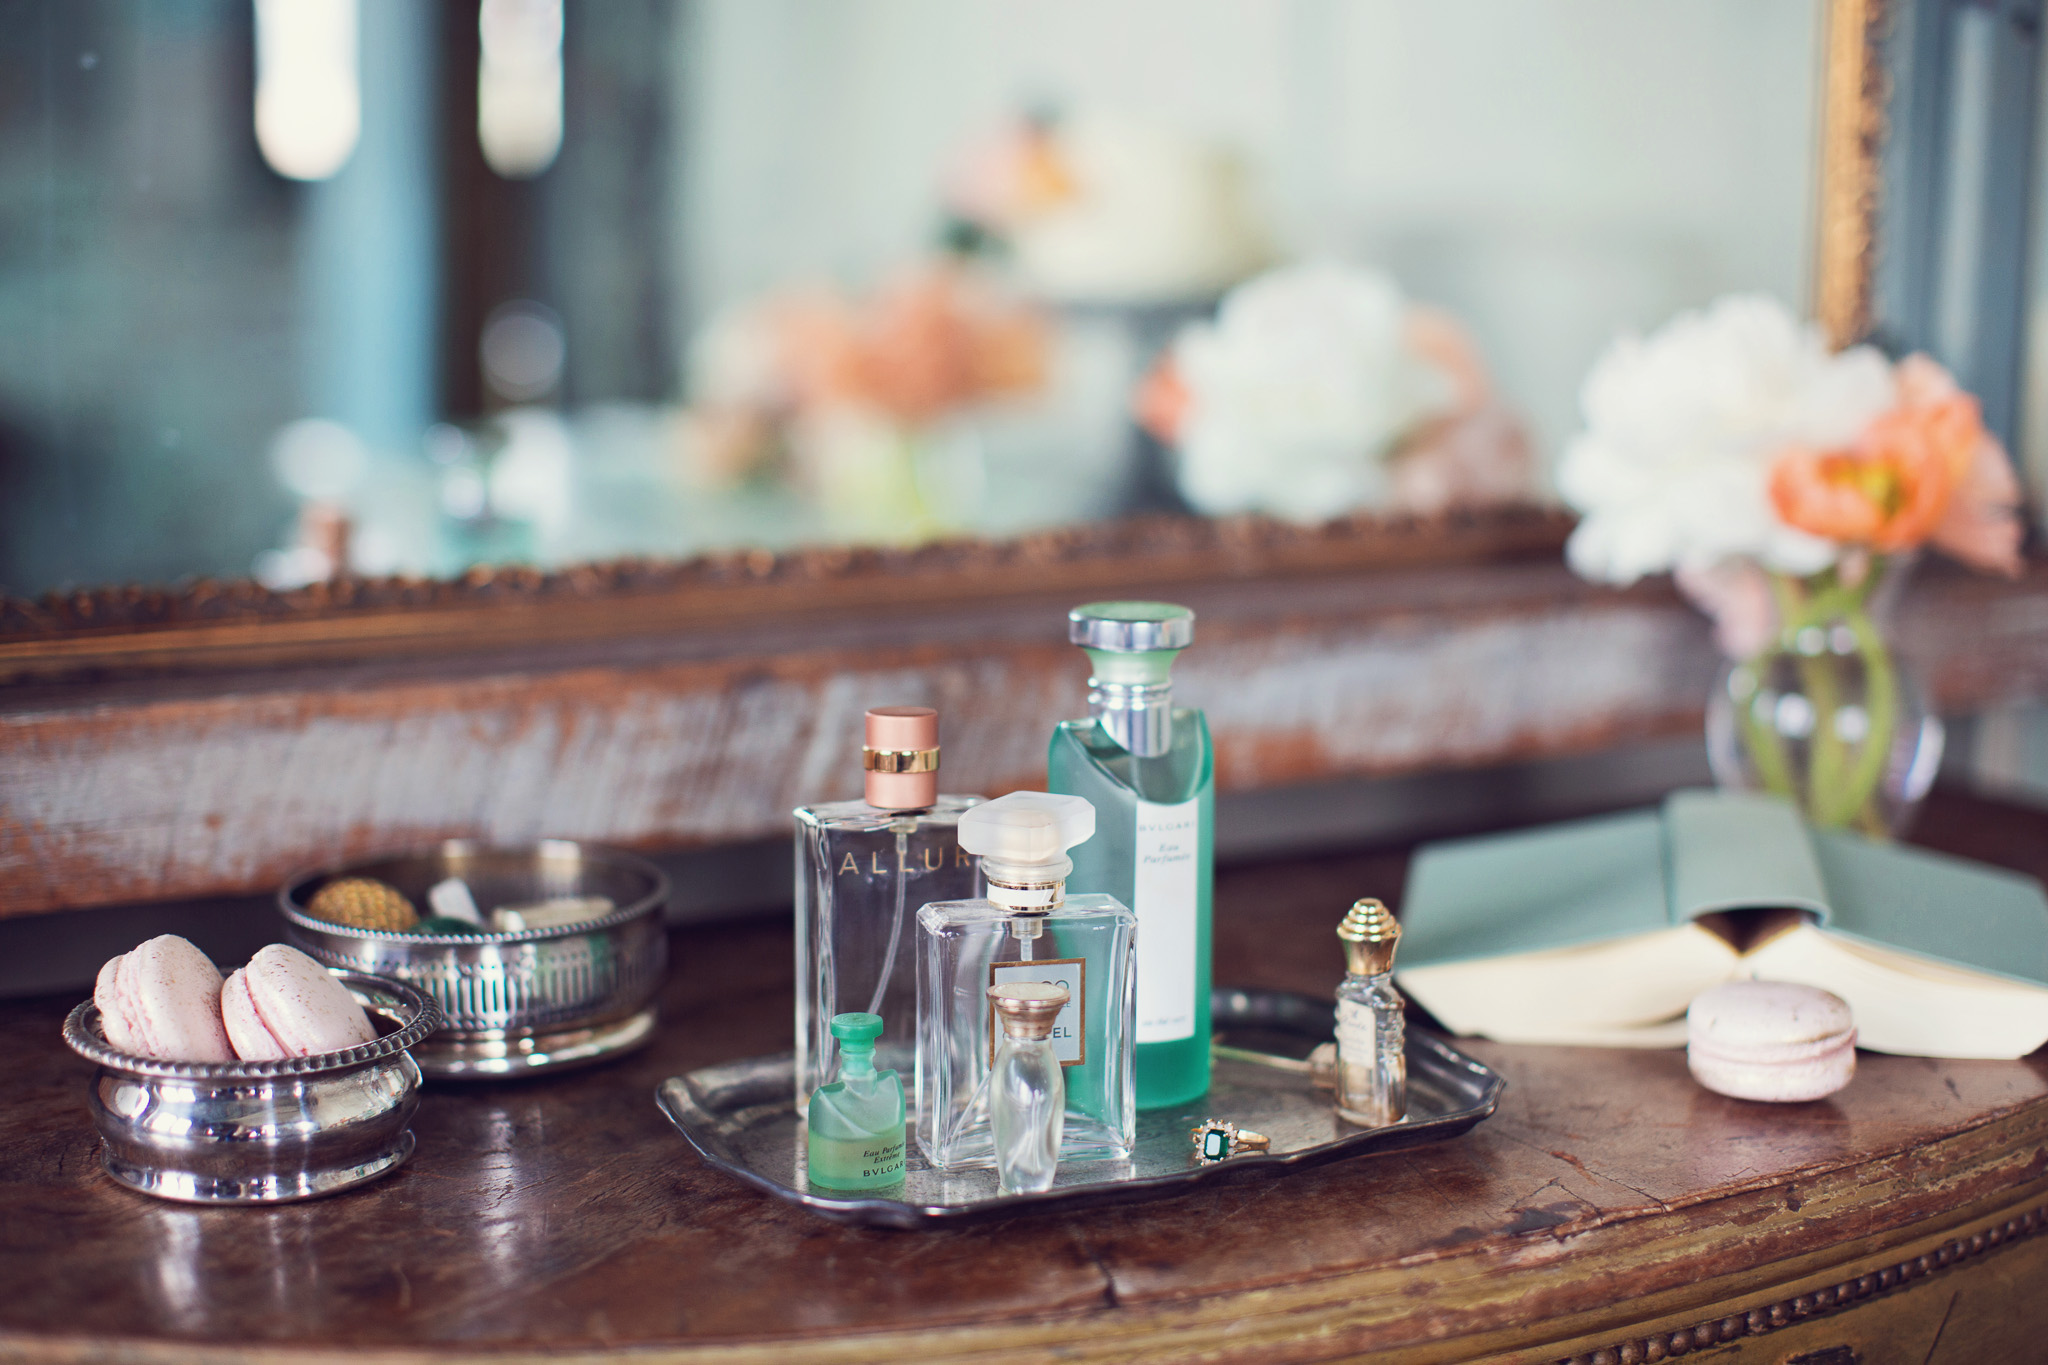 dressing-table-green-peach-perfume-bottles-feminine-vintage